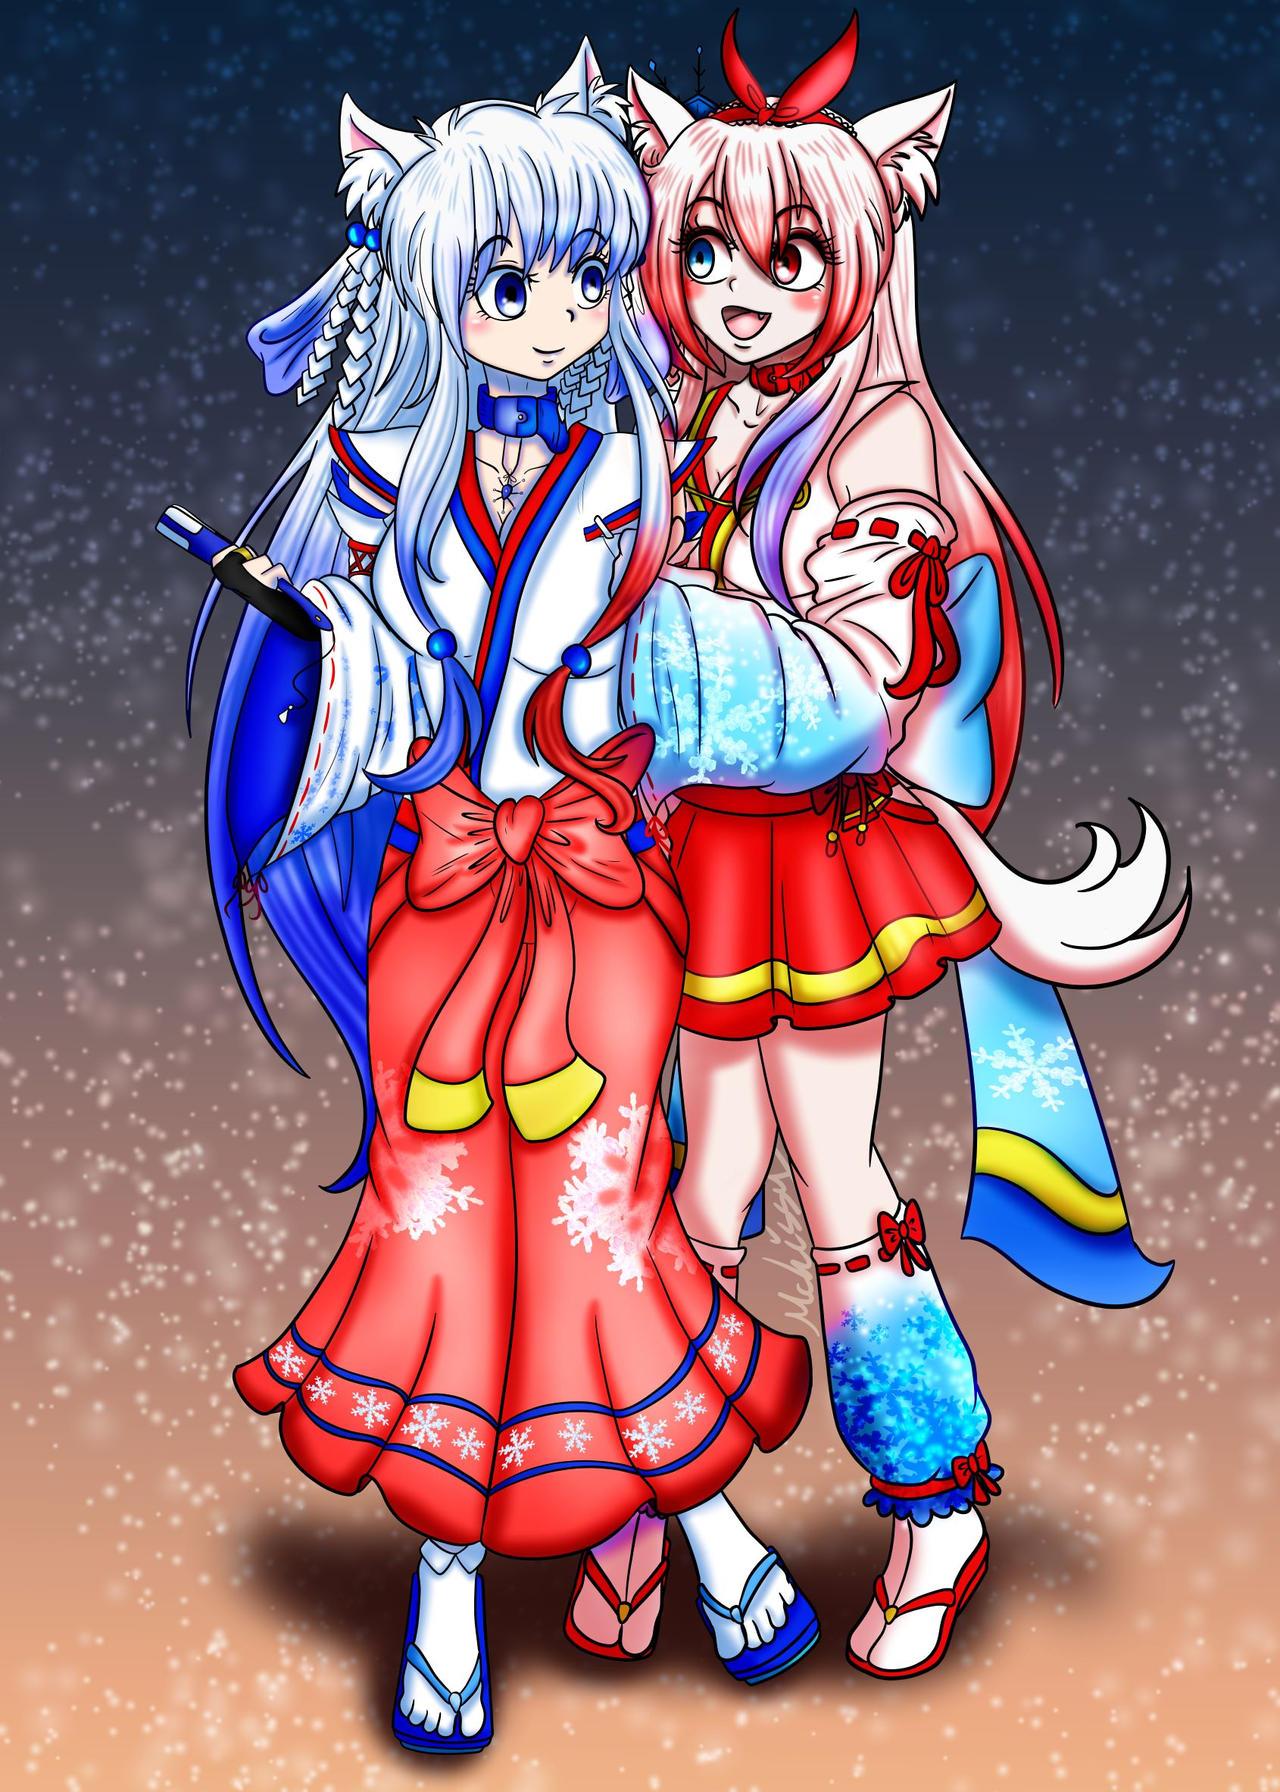 Fuyu Yuki and Shirai Yuki Request MegaMikoyEX7